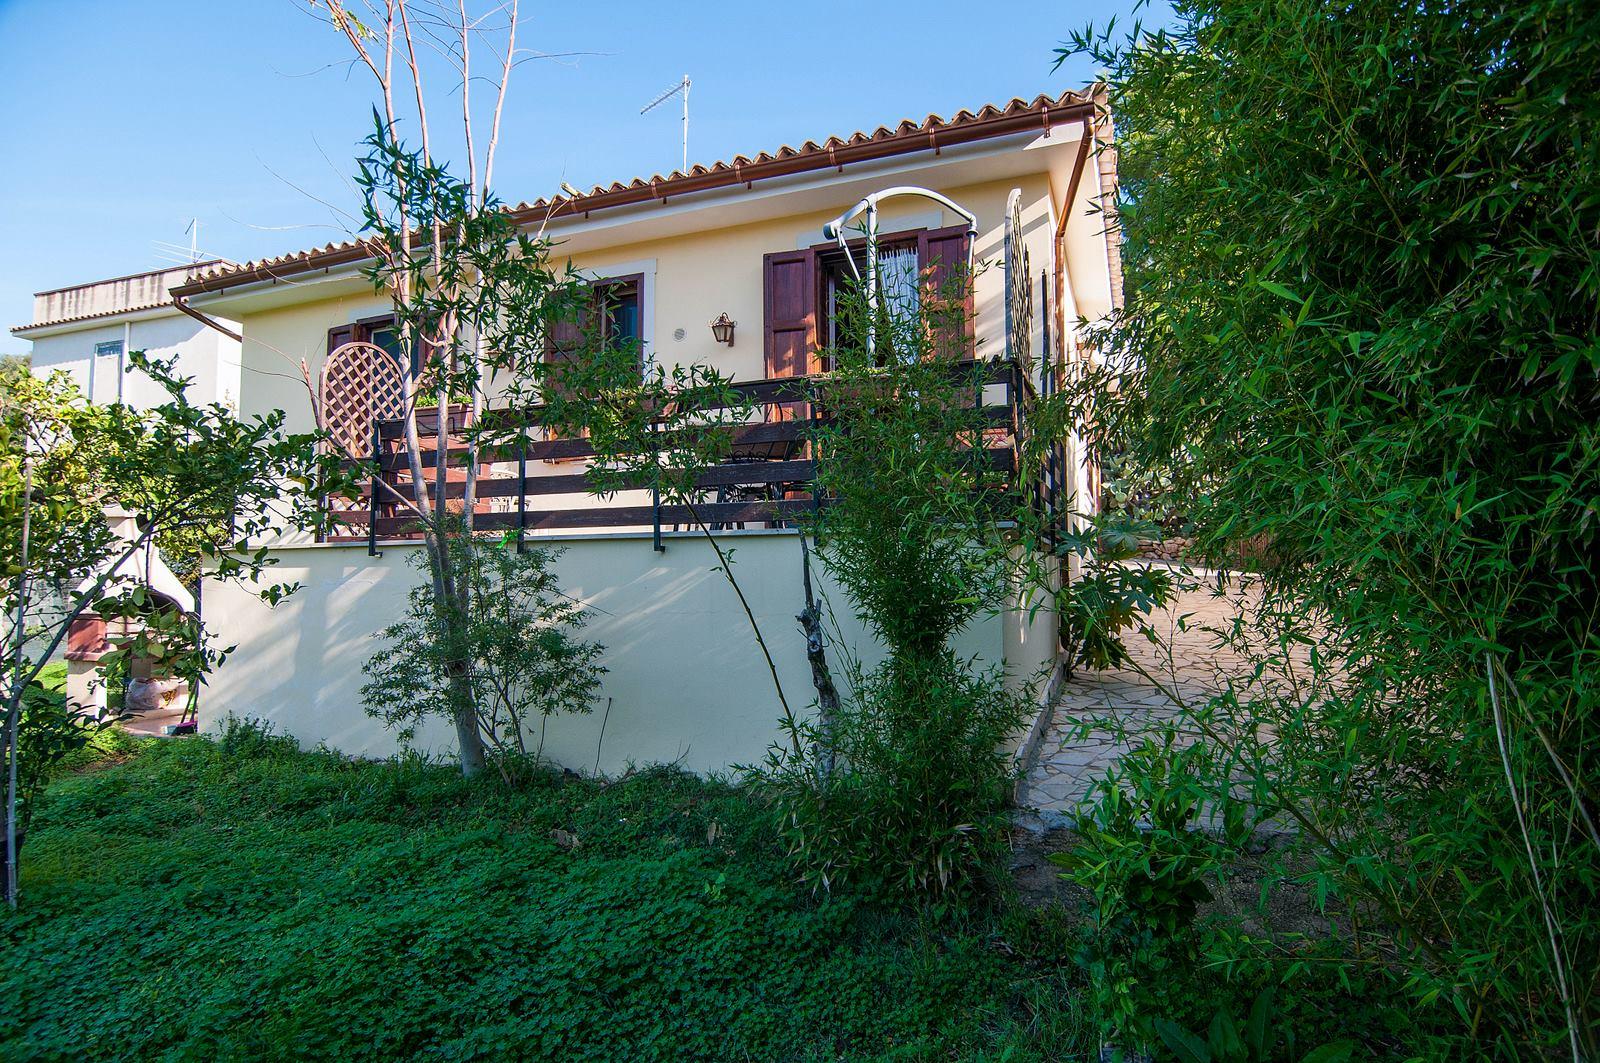 Maison de vacances Villetta a Lido (1540086), Lido di Noto, Siracusa, Sicile, Italie, image 14